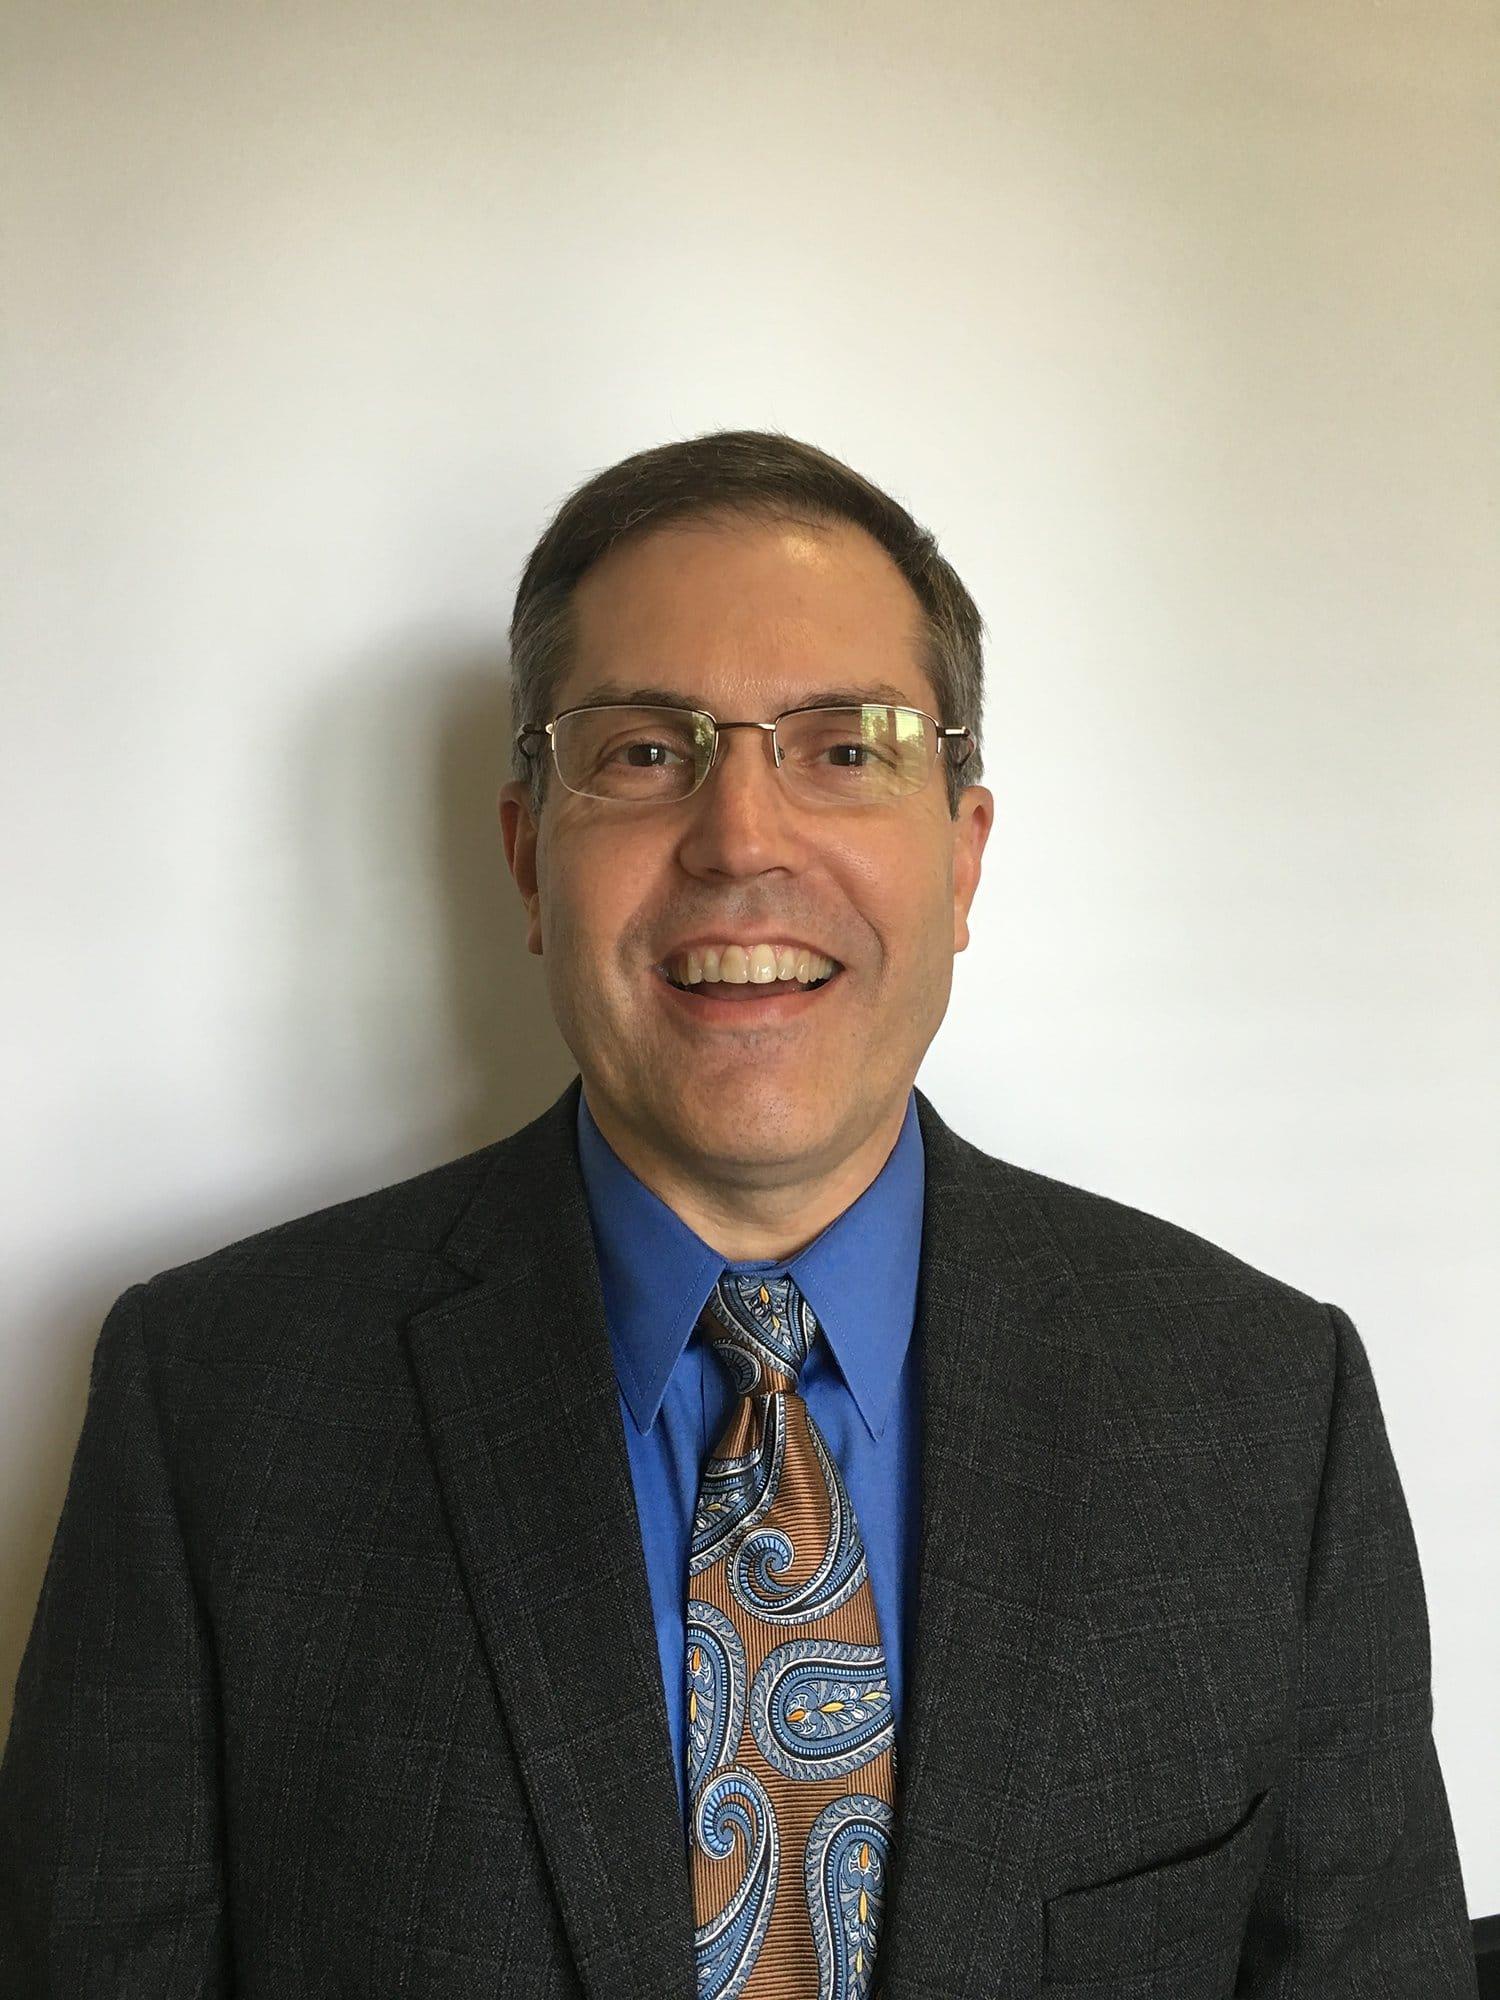 Paul J. Eichelberger